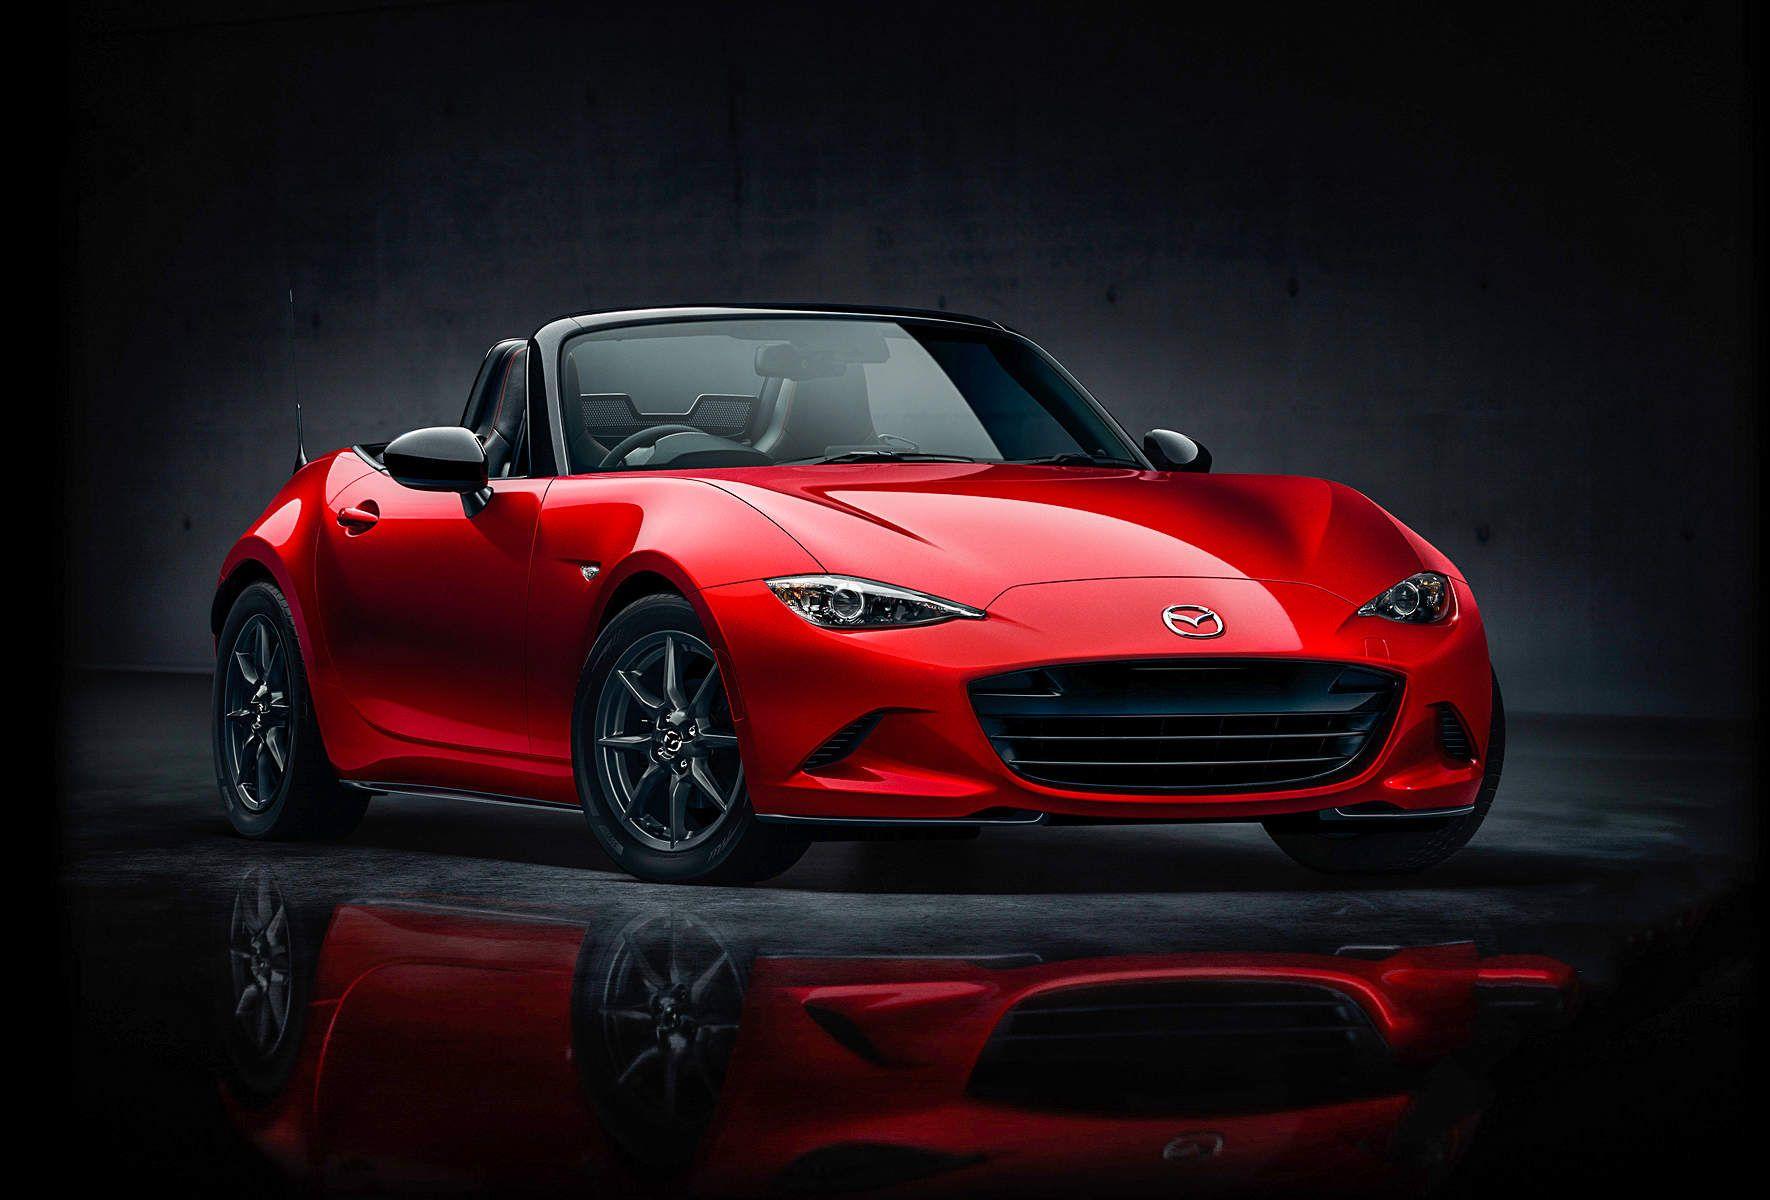 Mazda just dropped the brand new 2016 Miata...er...MX5